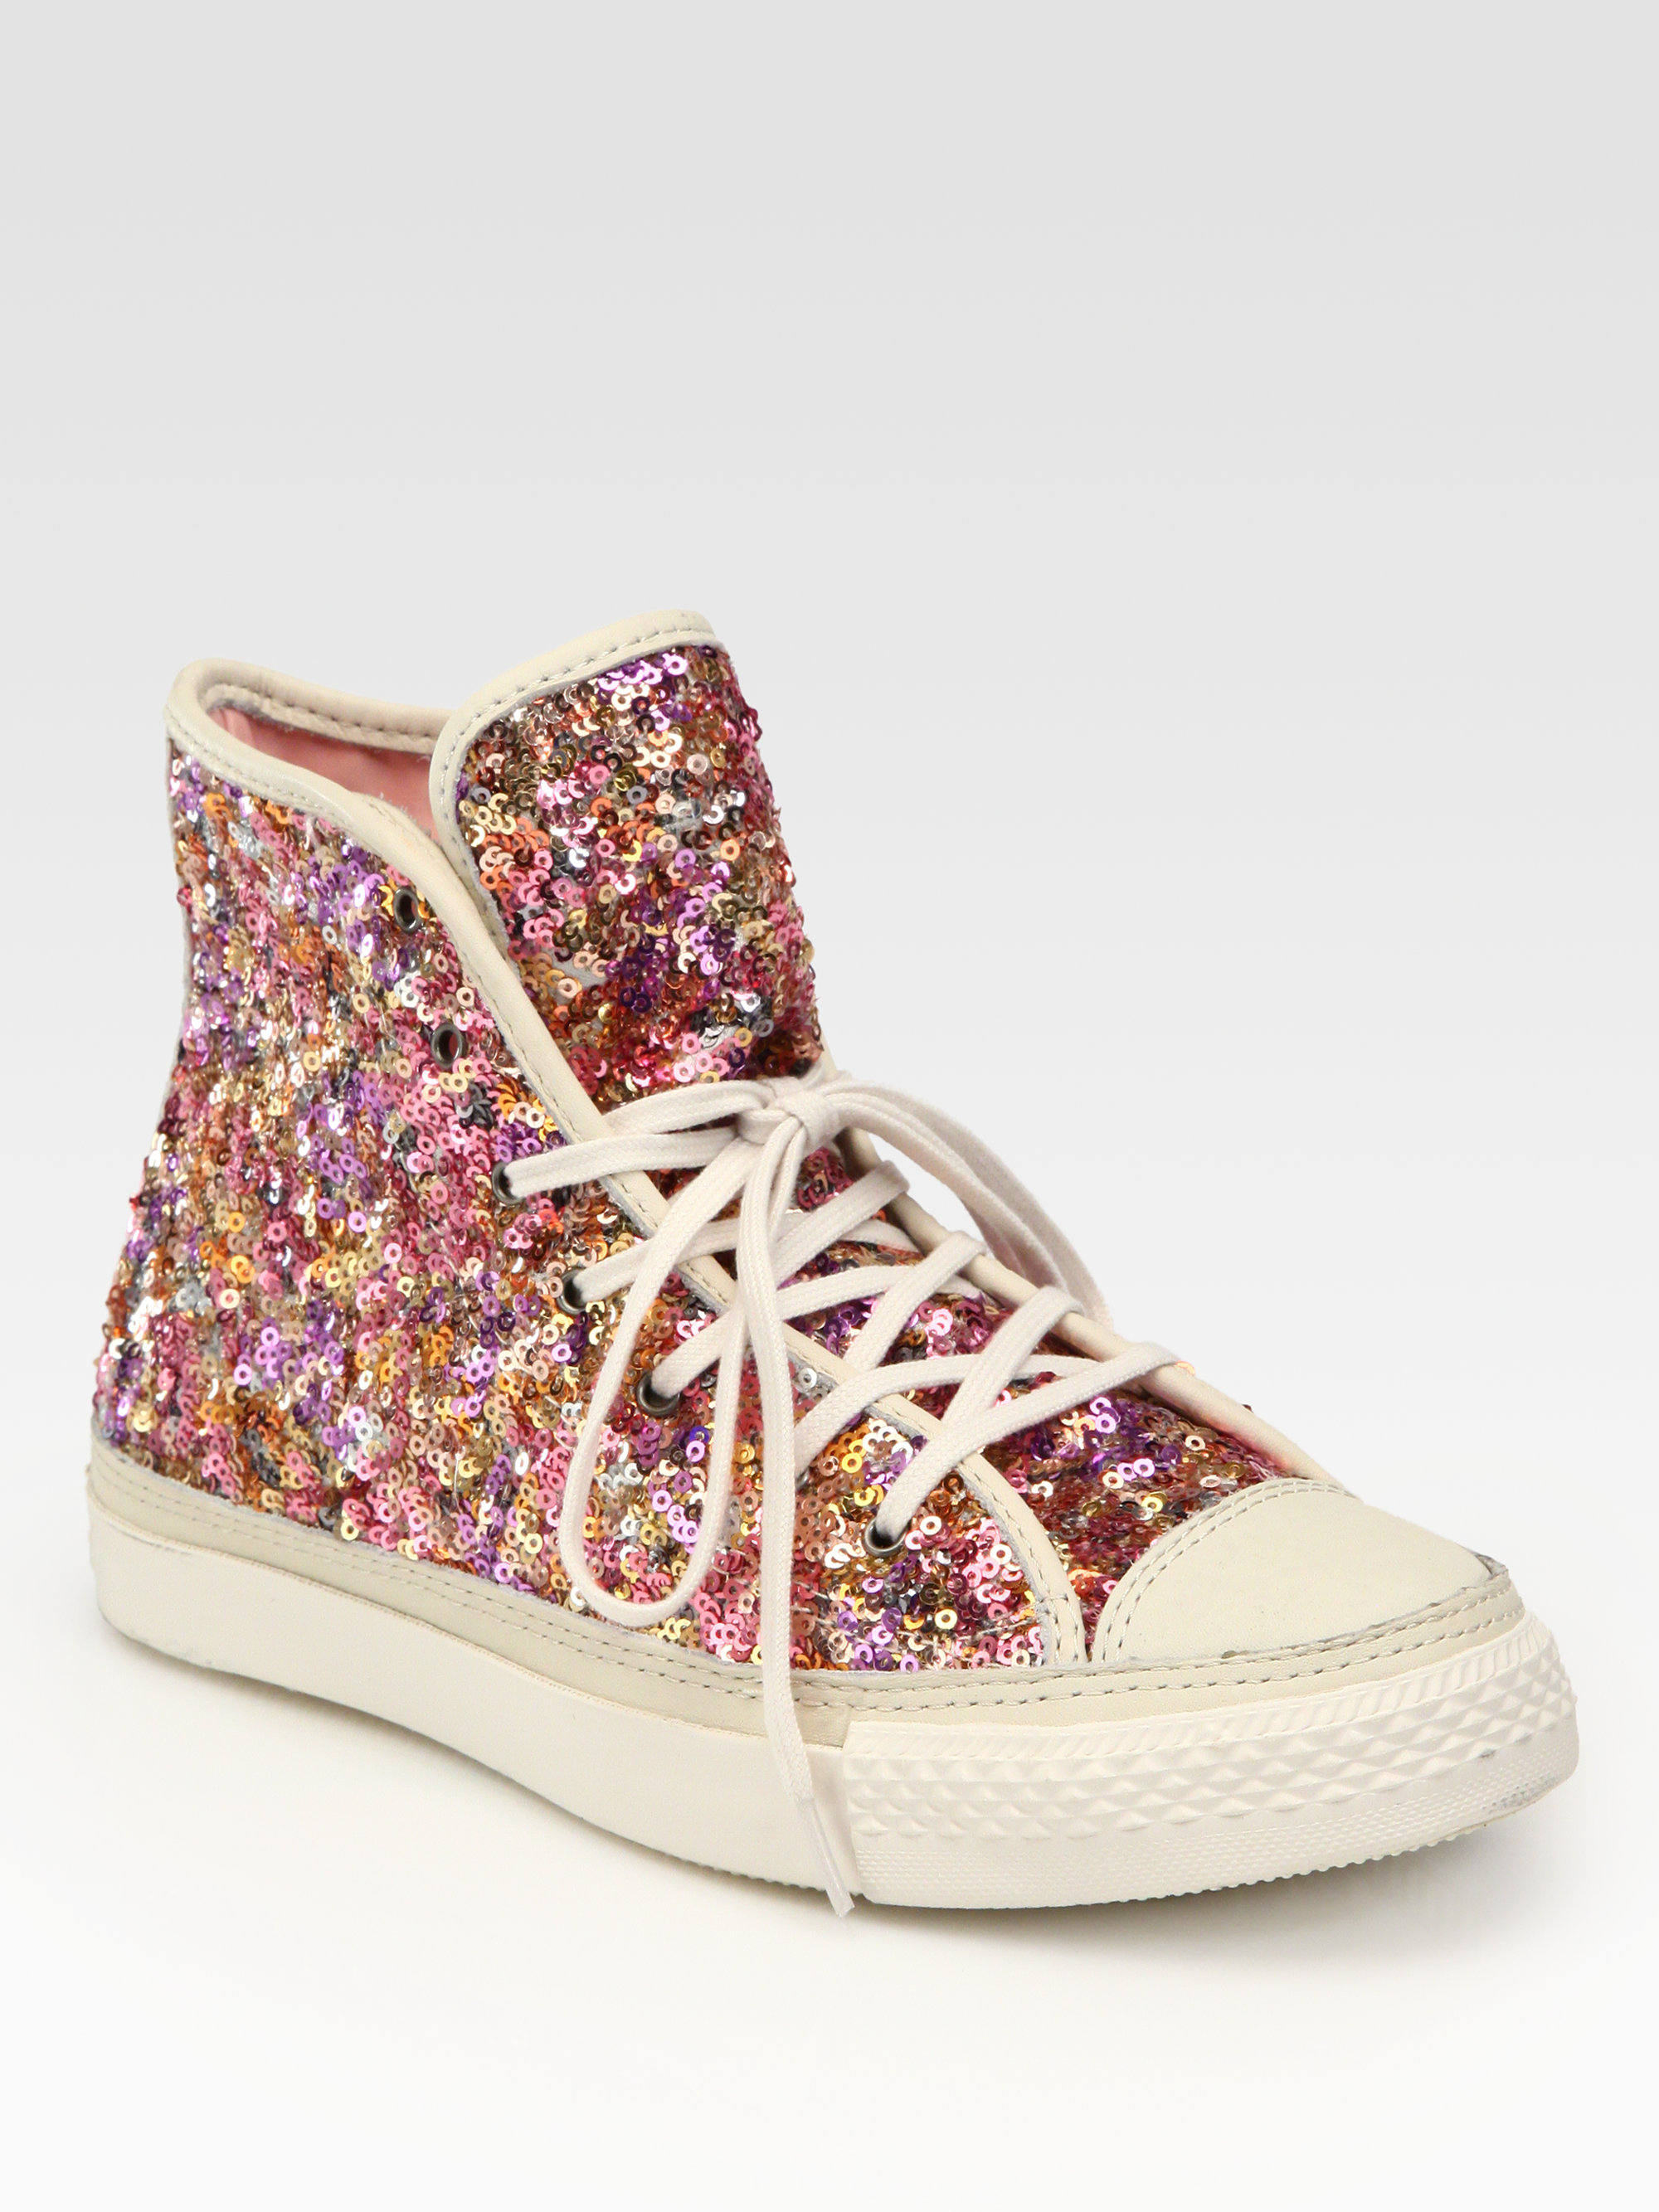 4288f1c799c298 ... wholesale lyst converse sequin hightop sneakers in pink 6b8e0 c8ecd